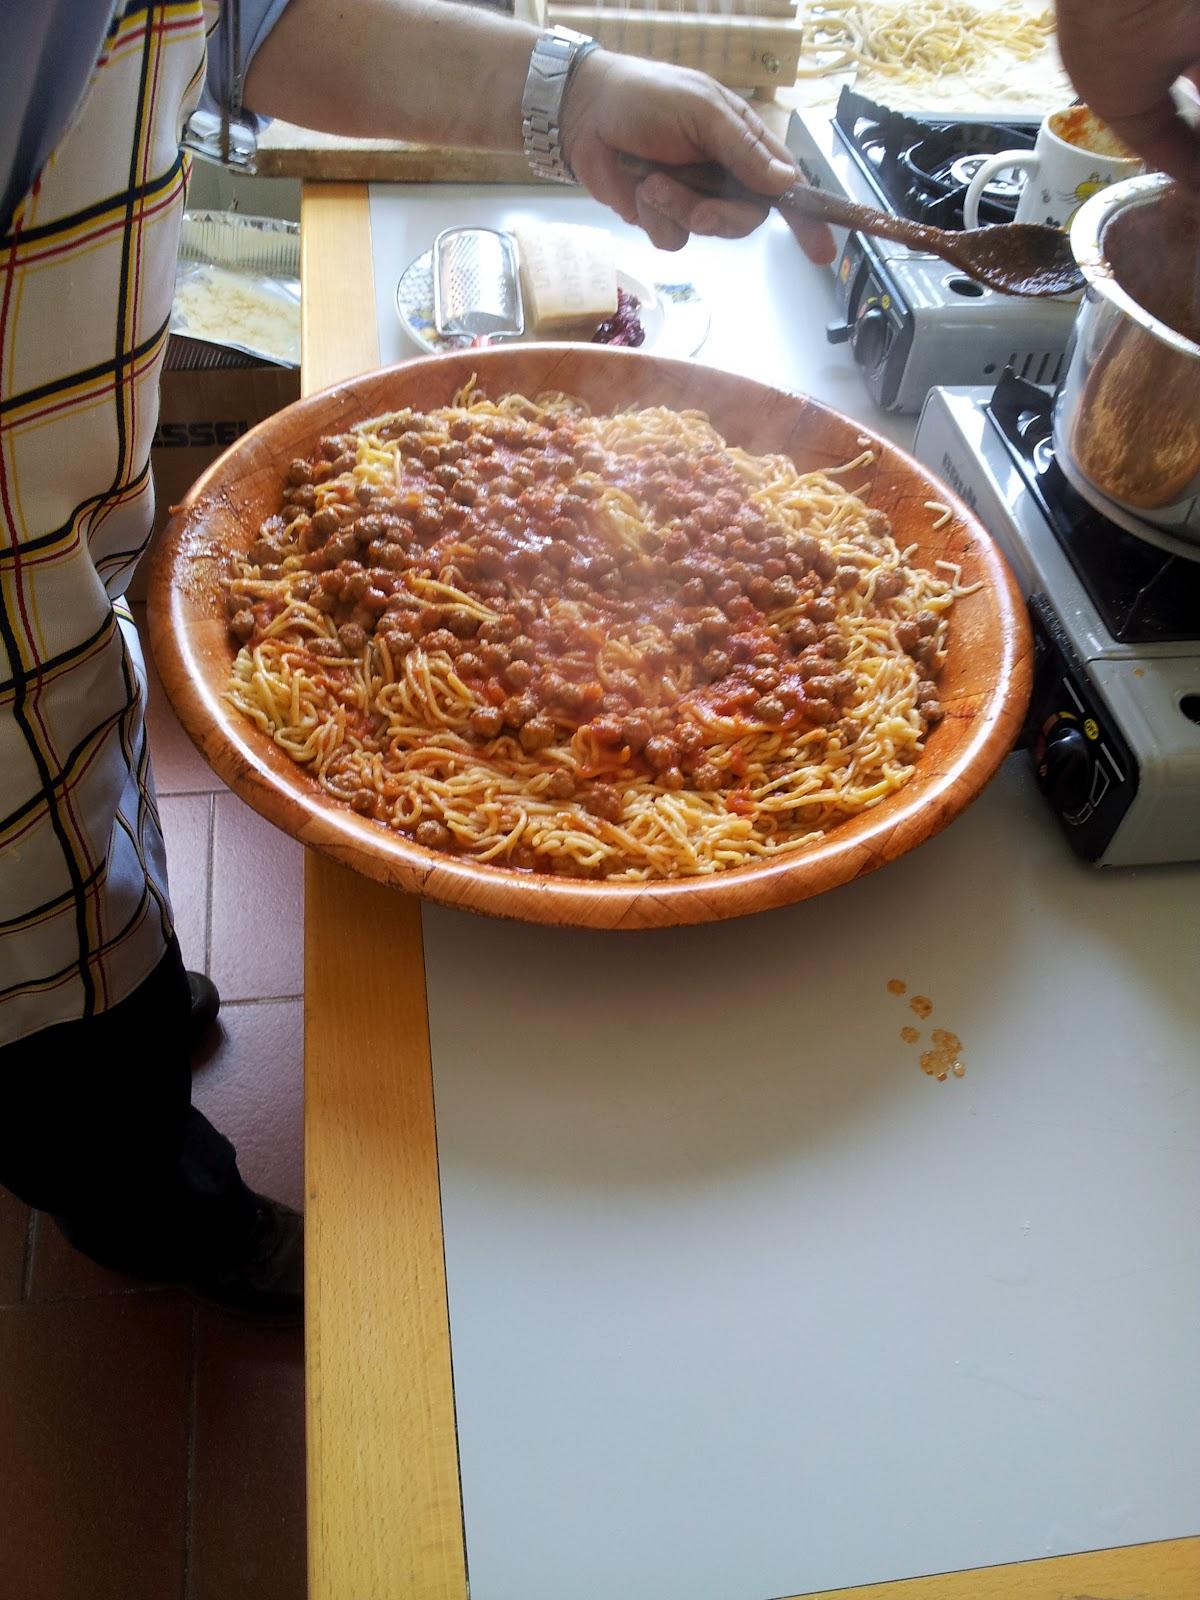 Saperi sapori e culture ricette cucina regionale italiana spaghetti alla chitarra - Cucina regionale italiana ...